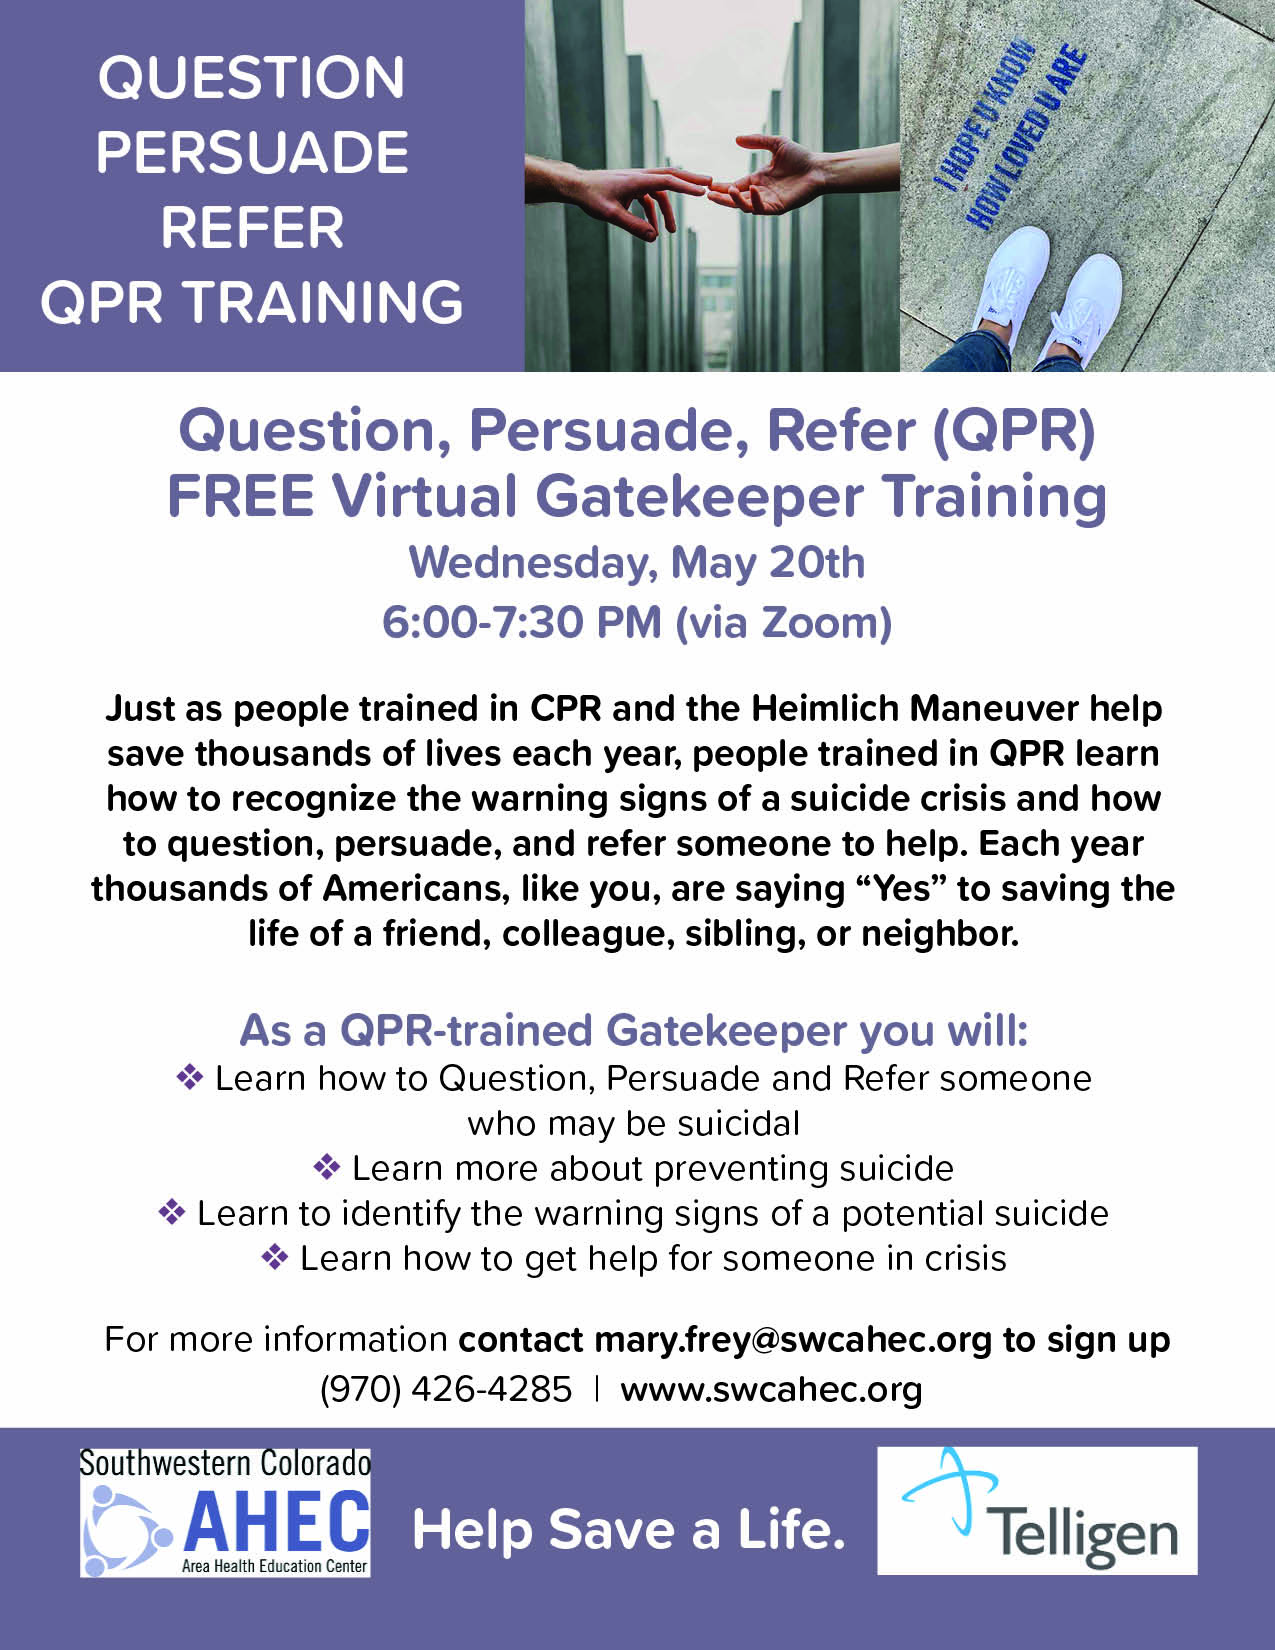 QPR flyer (VS2)